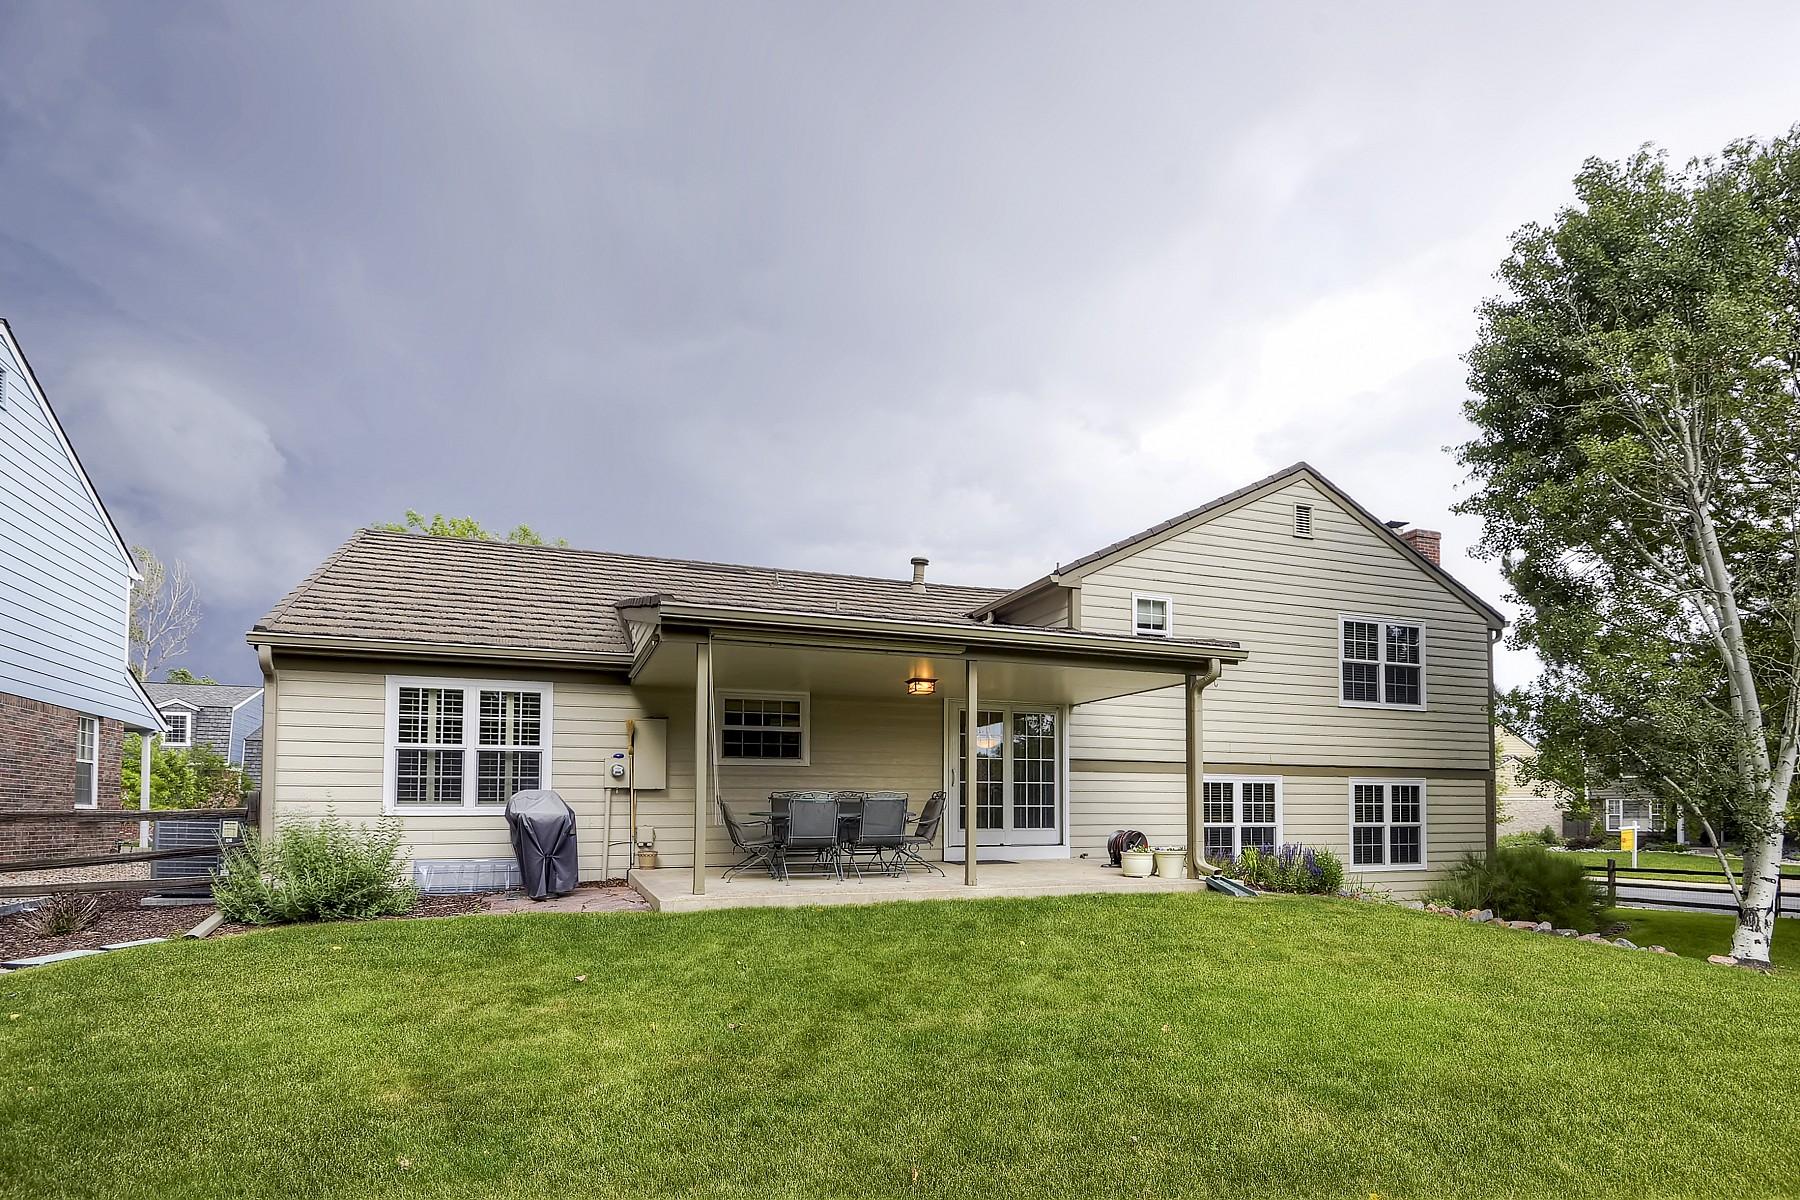 5291 South Estes Way, Littleton, CO 80123